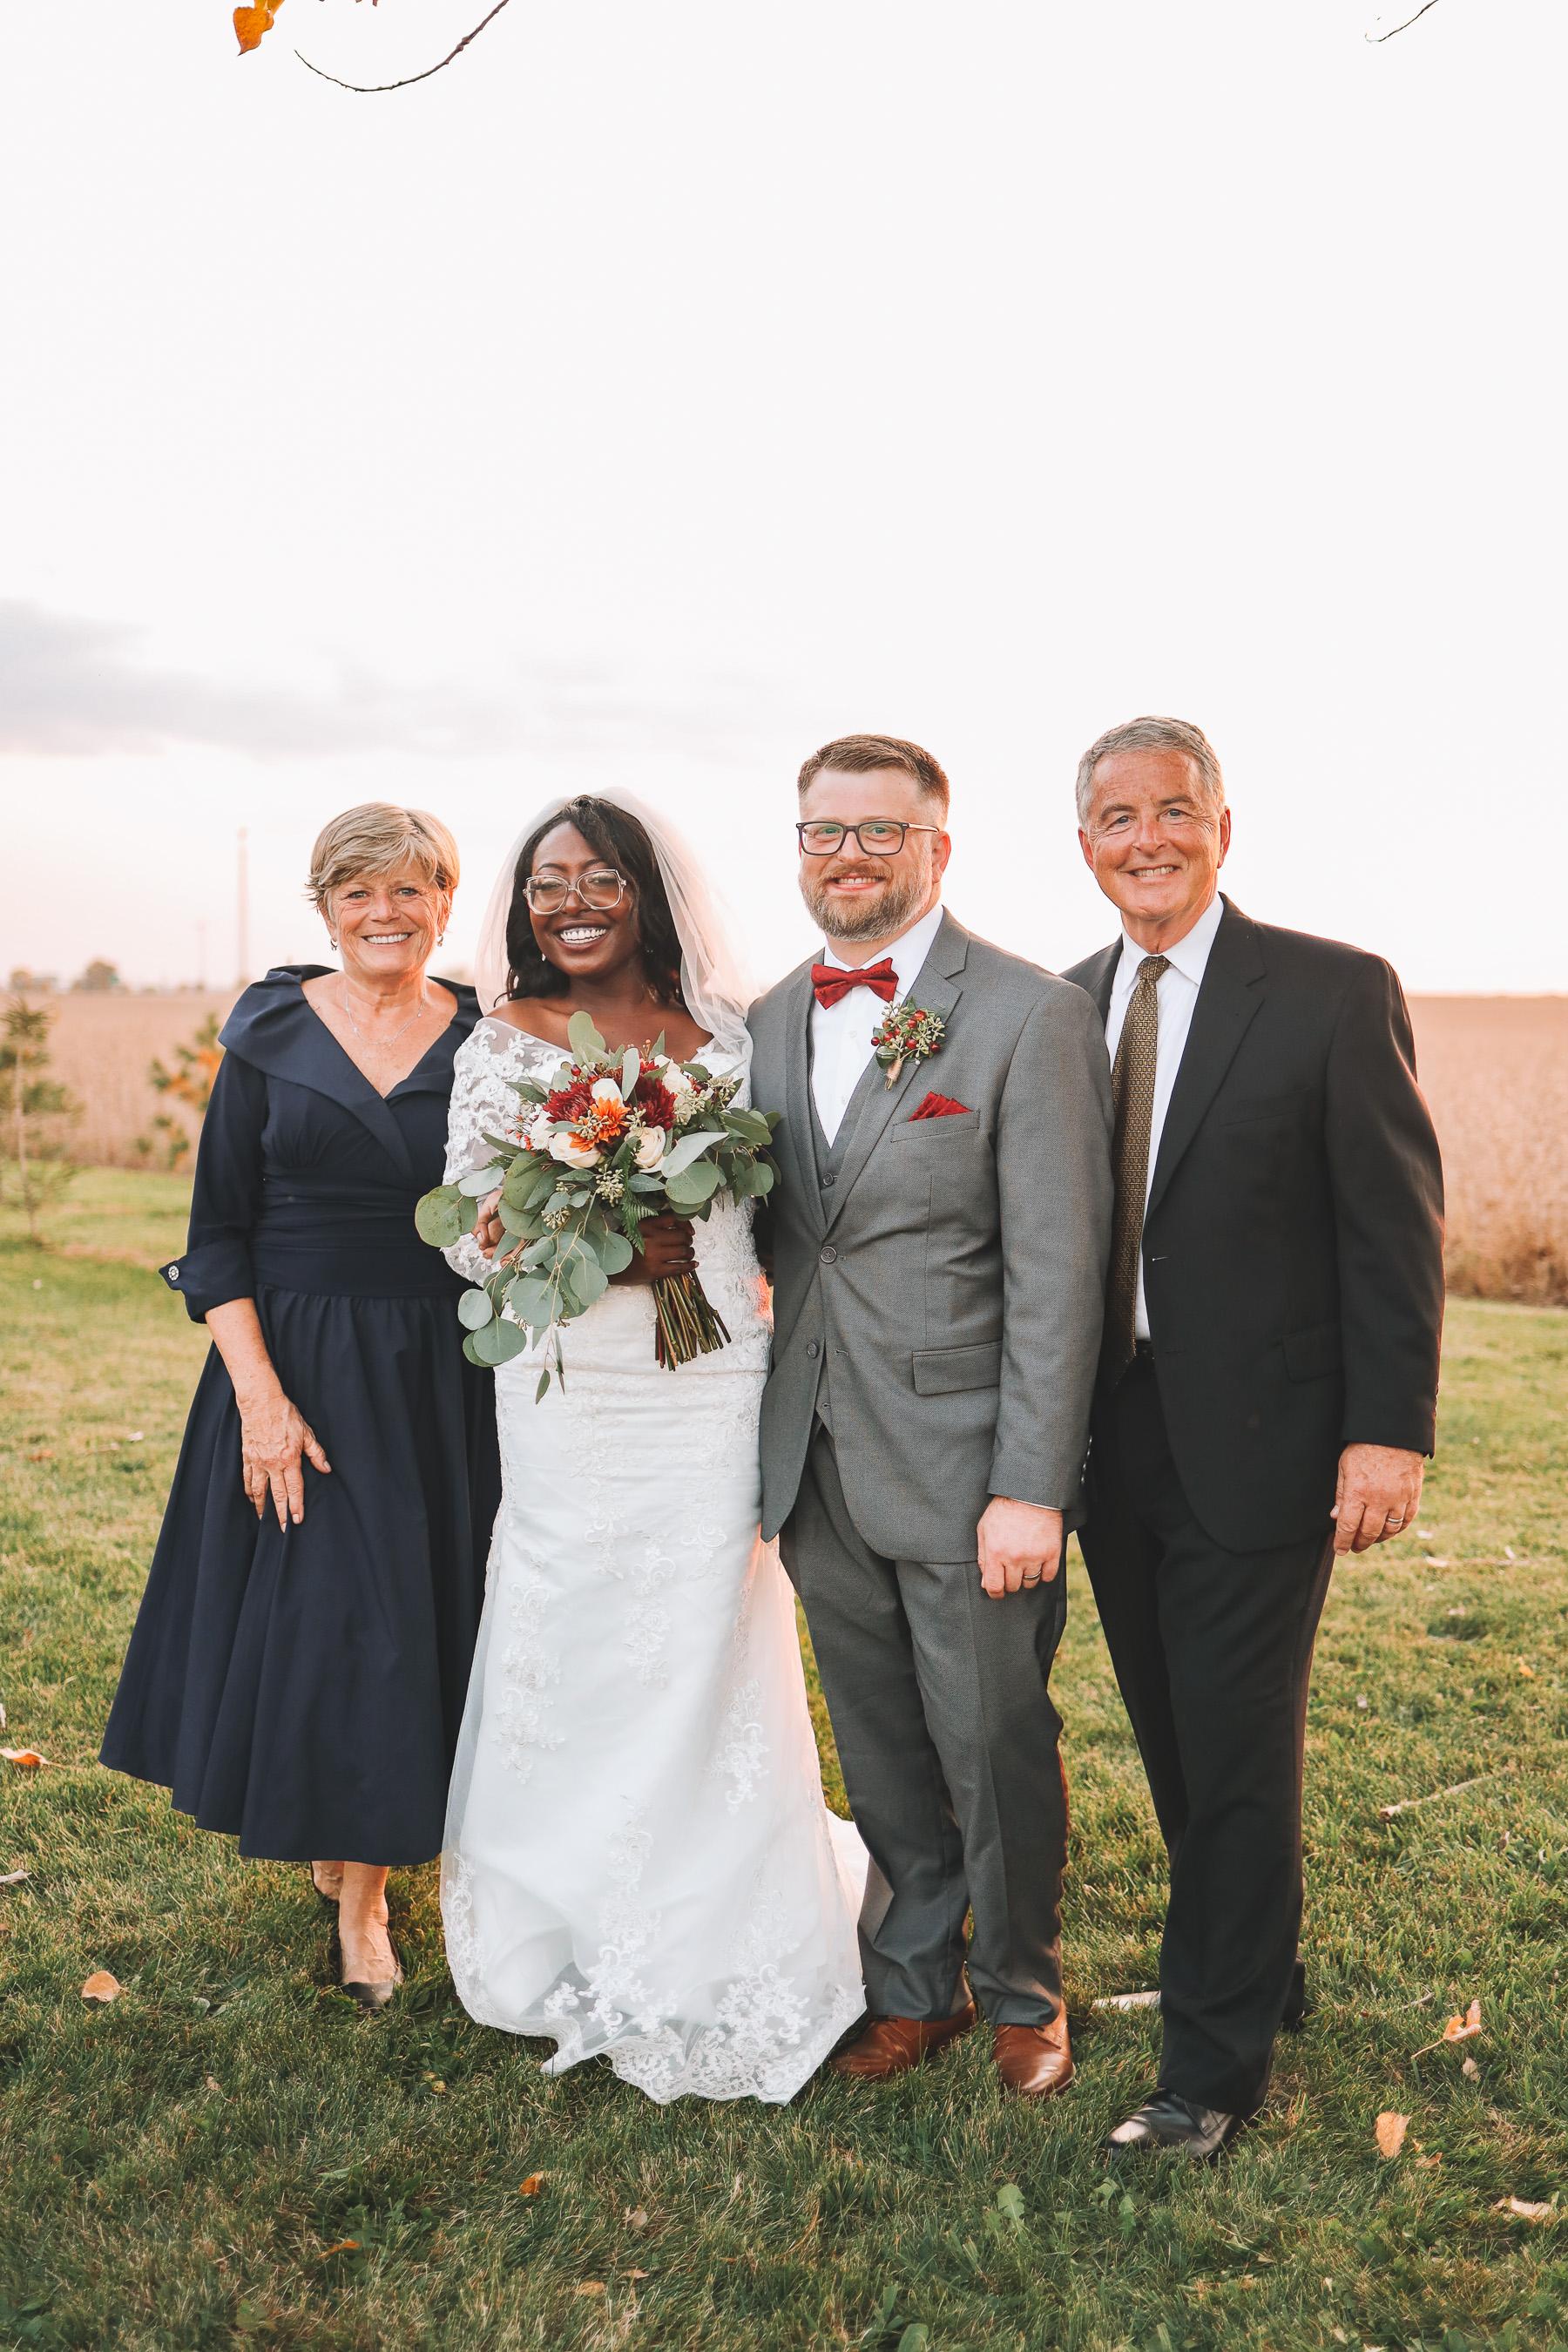 outdoor wedding photo ideas